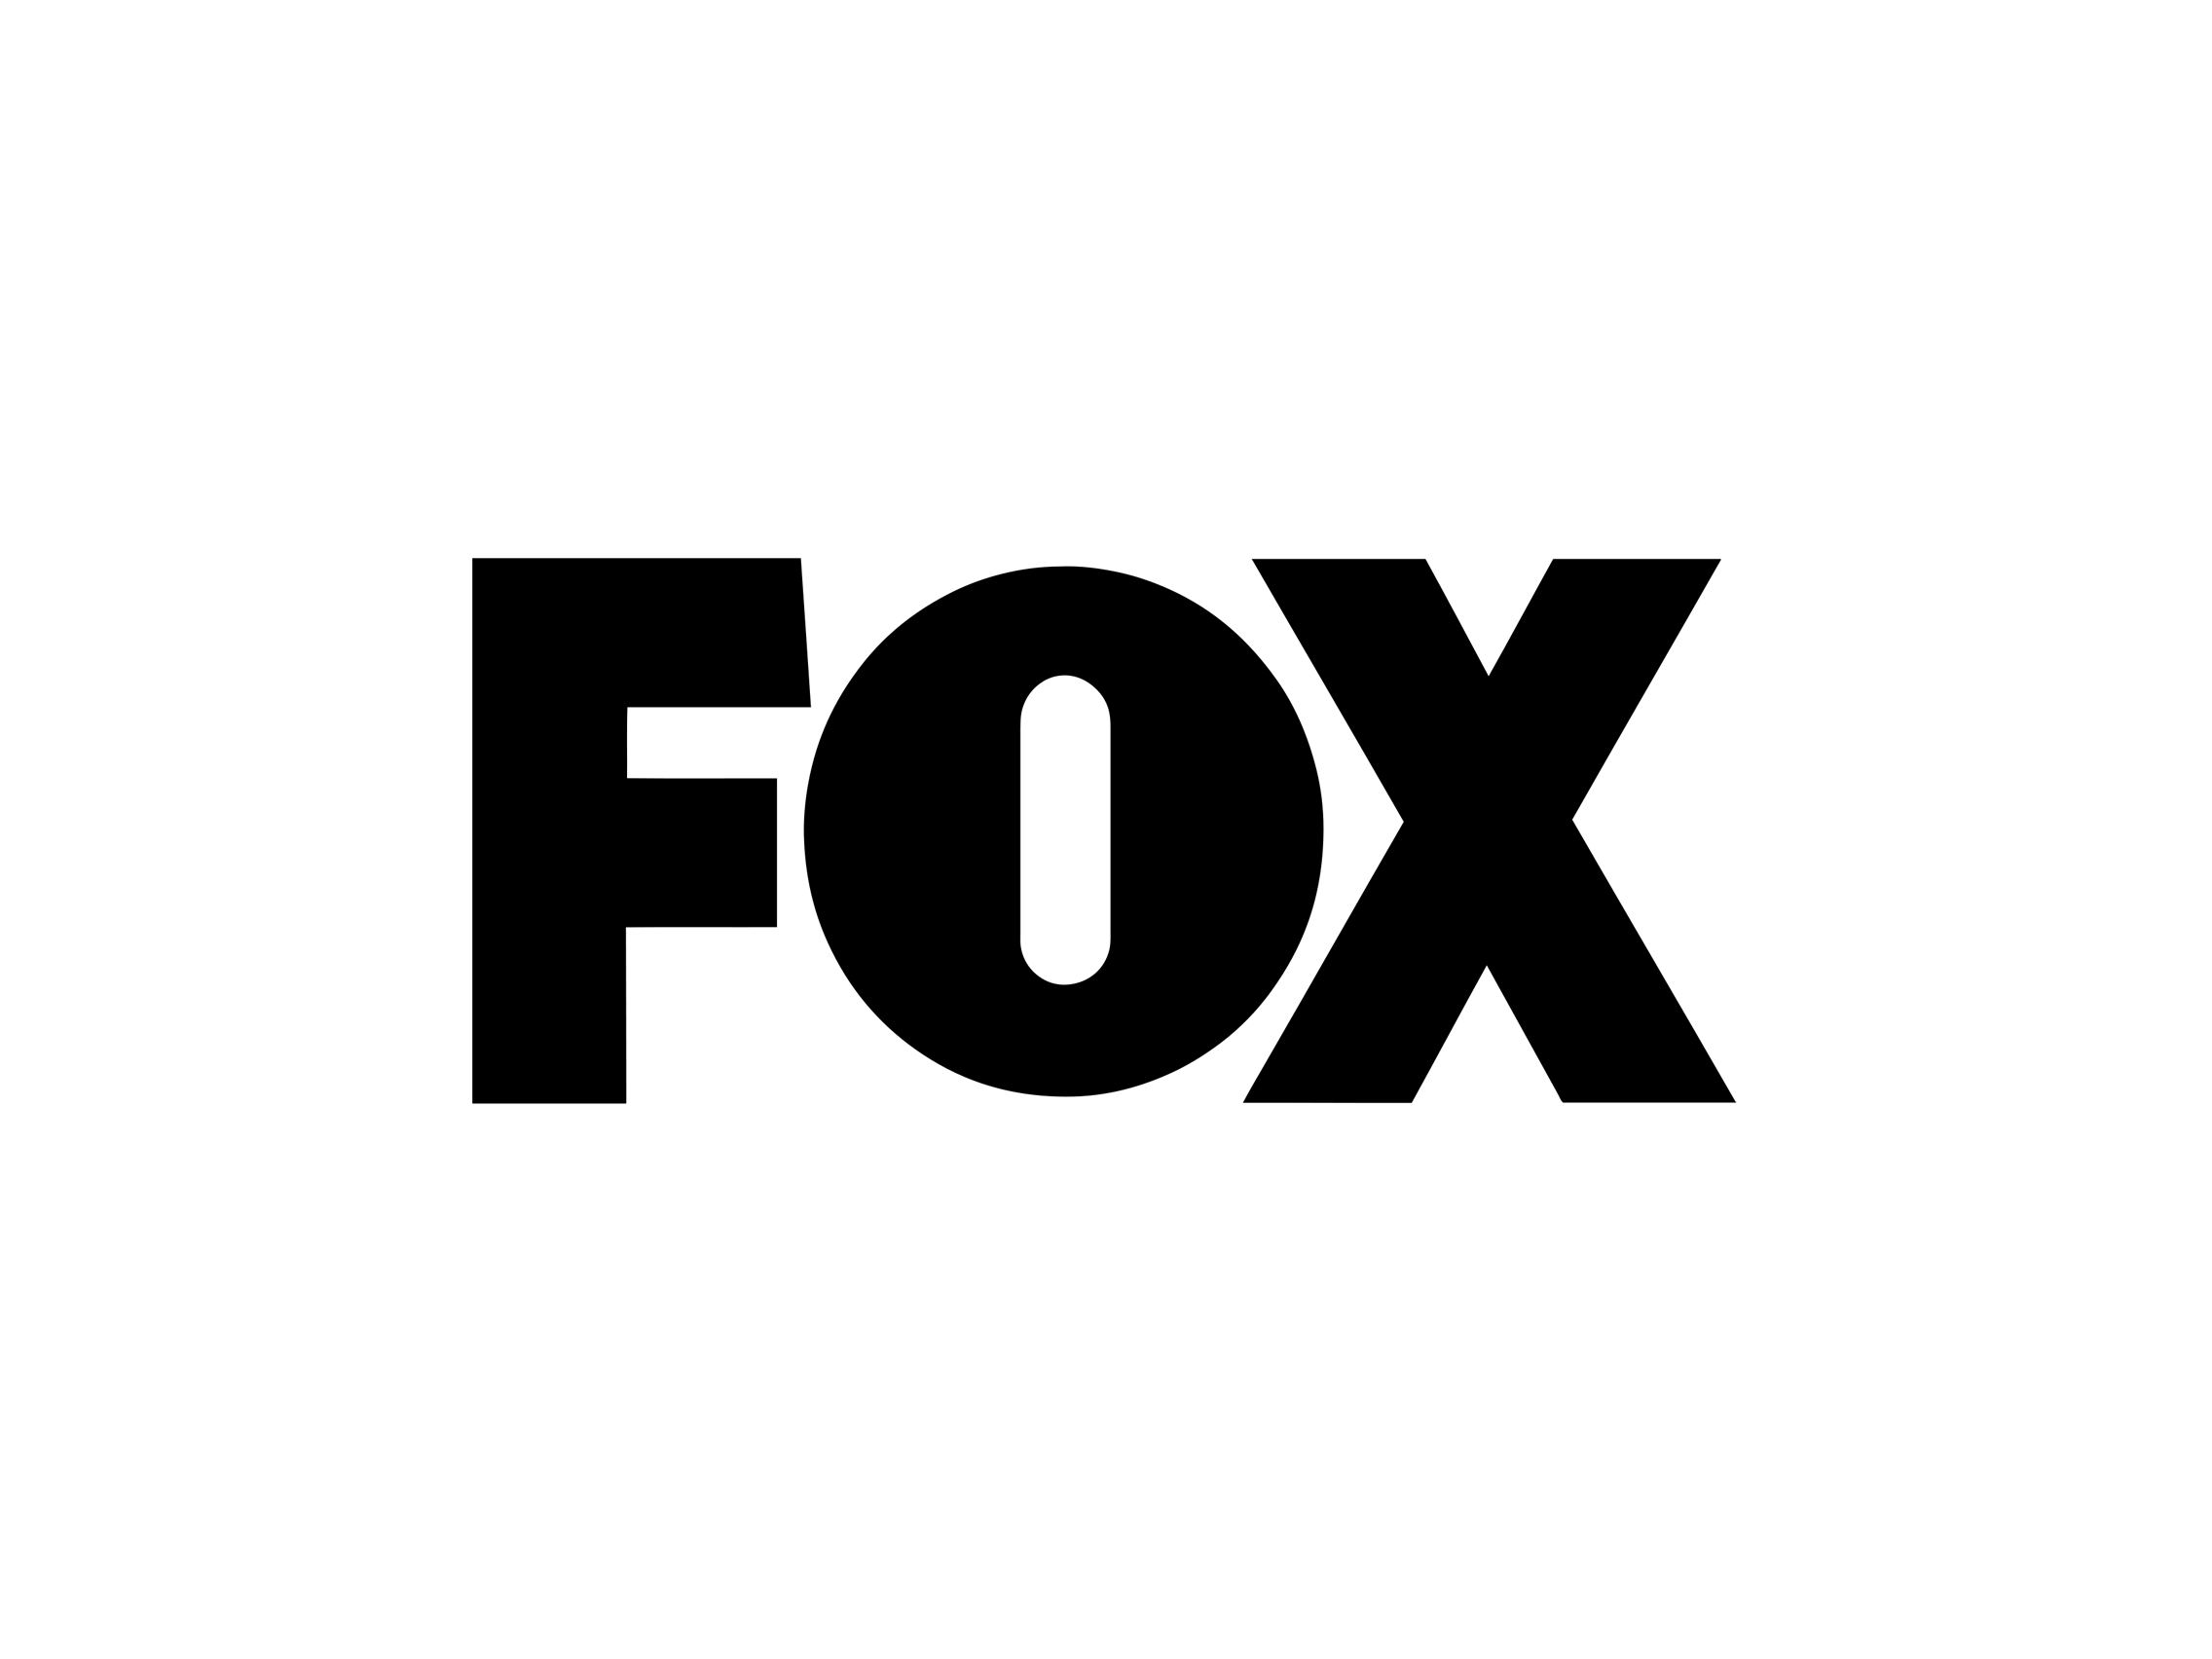 Channel 7 logo clipart black and white svg black and white download Fox Logo - ClipArt Best svg black and white download